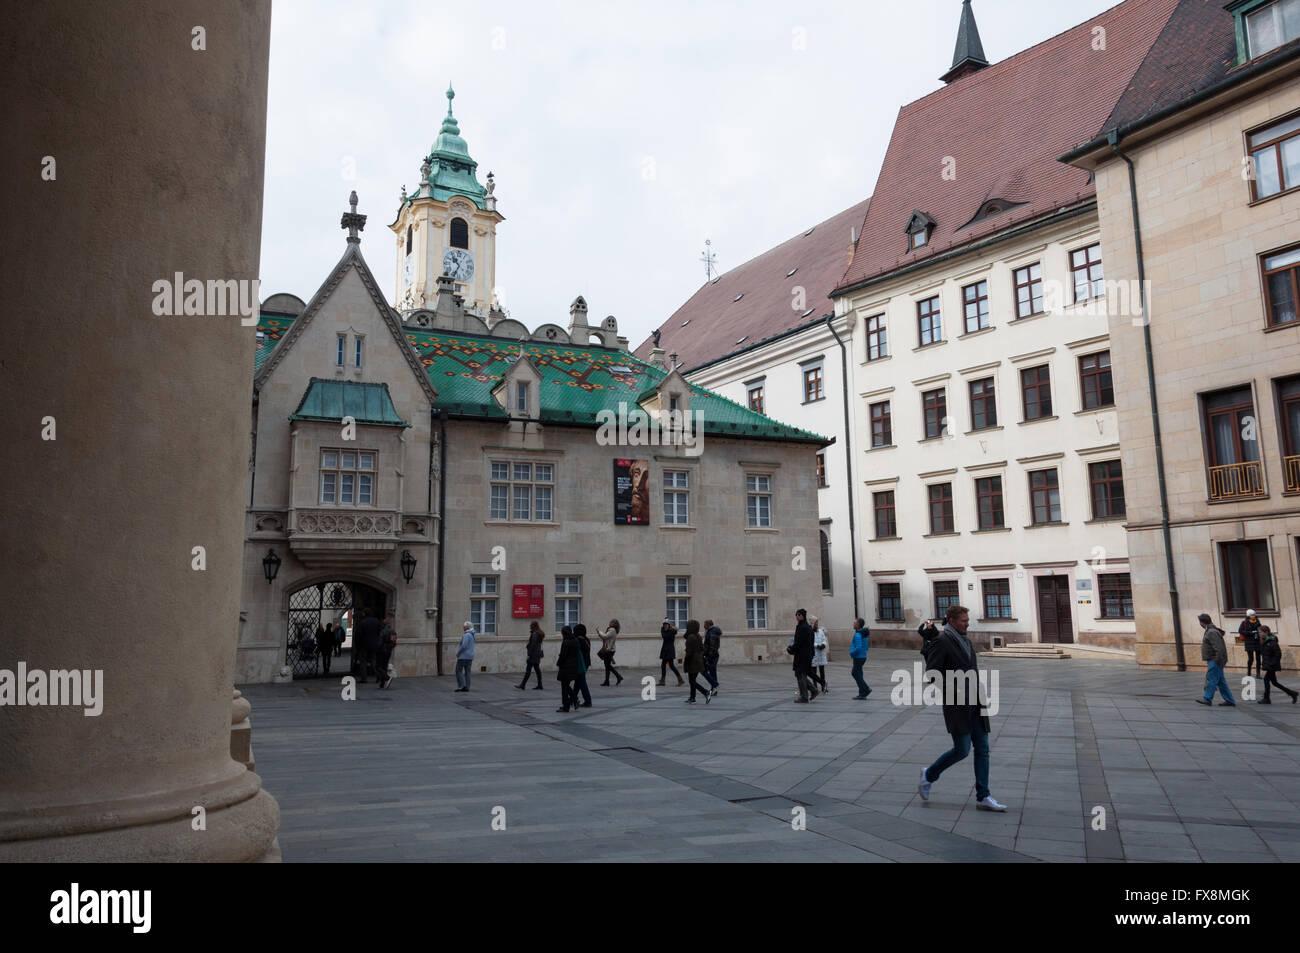 The Old Town Hall in Bratislava, Slovakia Stock Photo